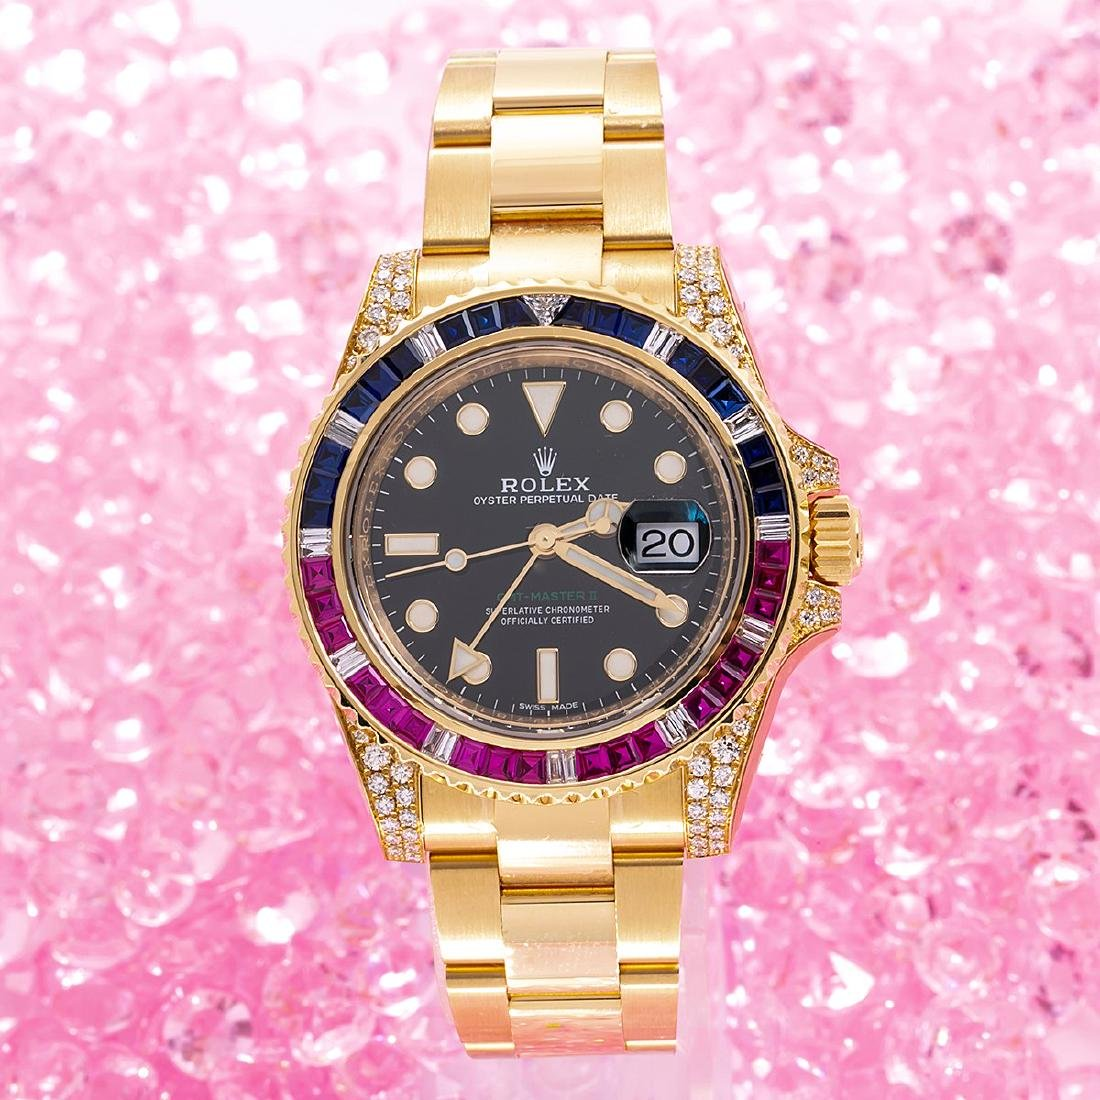 18K YELLOW GOLD ROLEX GMT MASTER II 116718 40MM BLACK - 5